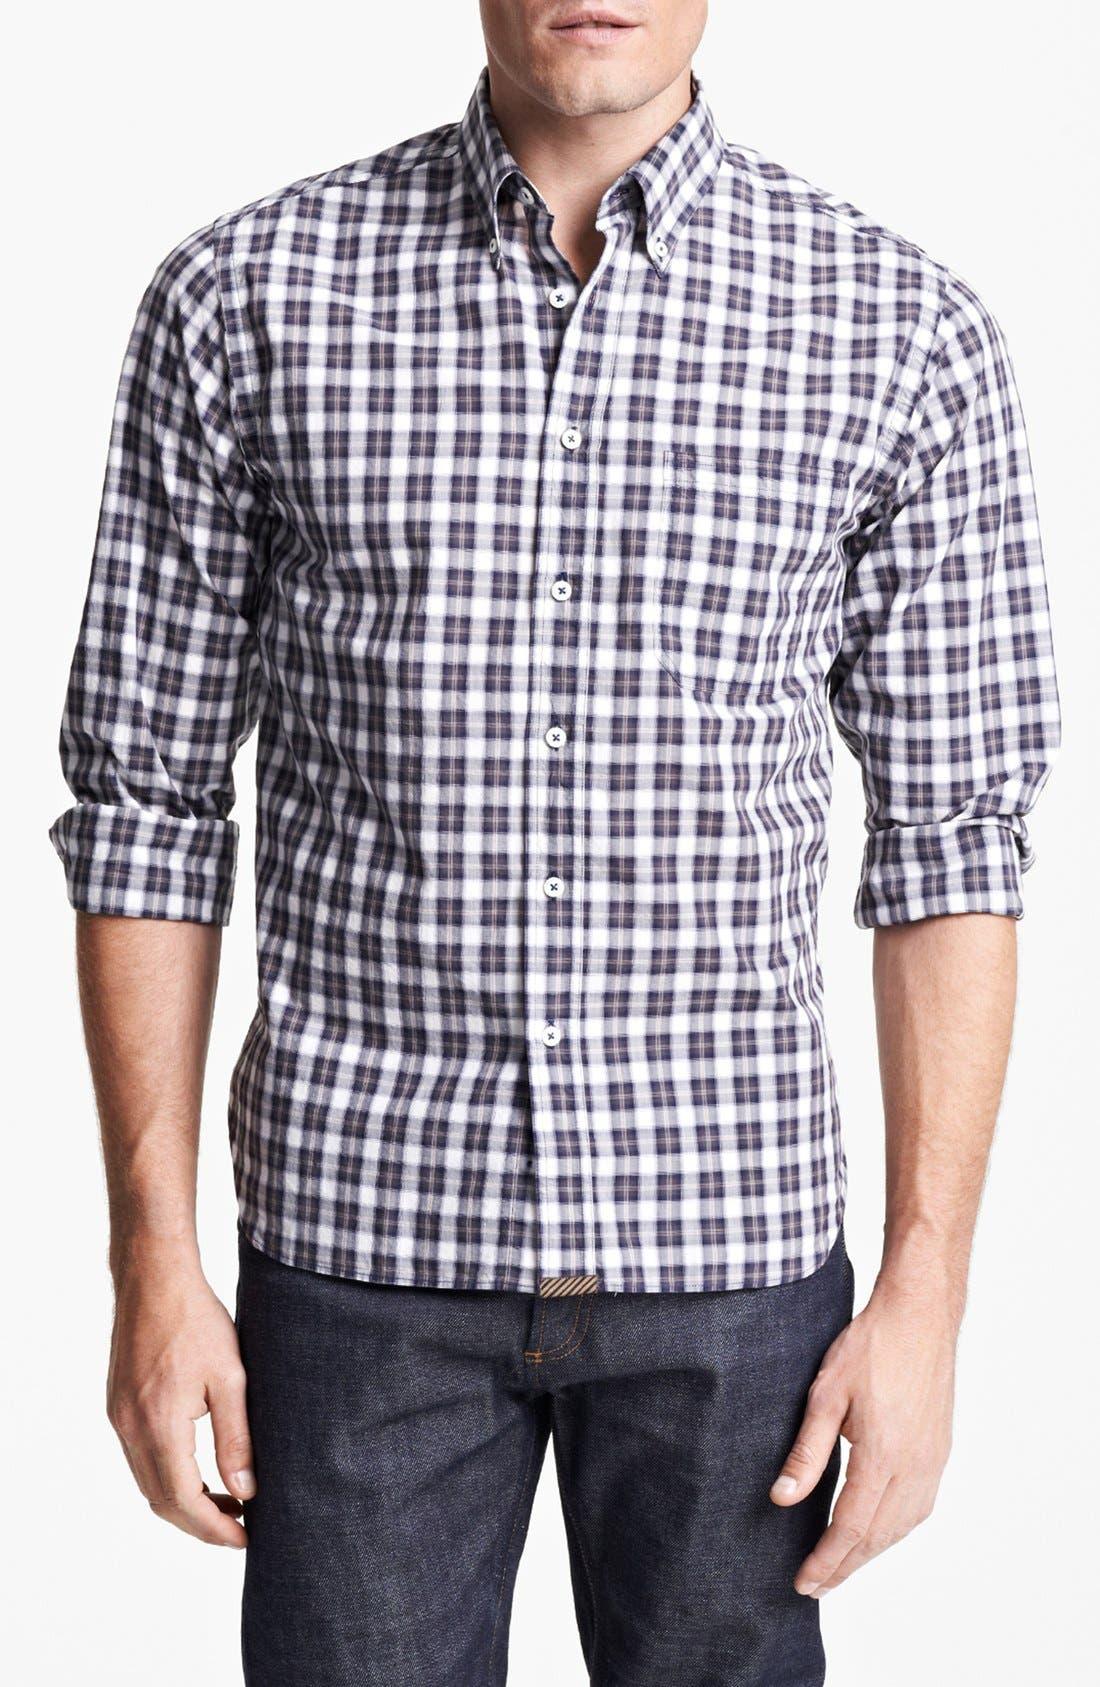 Alternate Image 1 Selected - Billy Reid 'Tuscumbia' Plaid Shirt